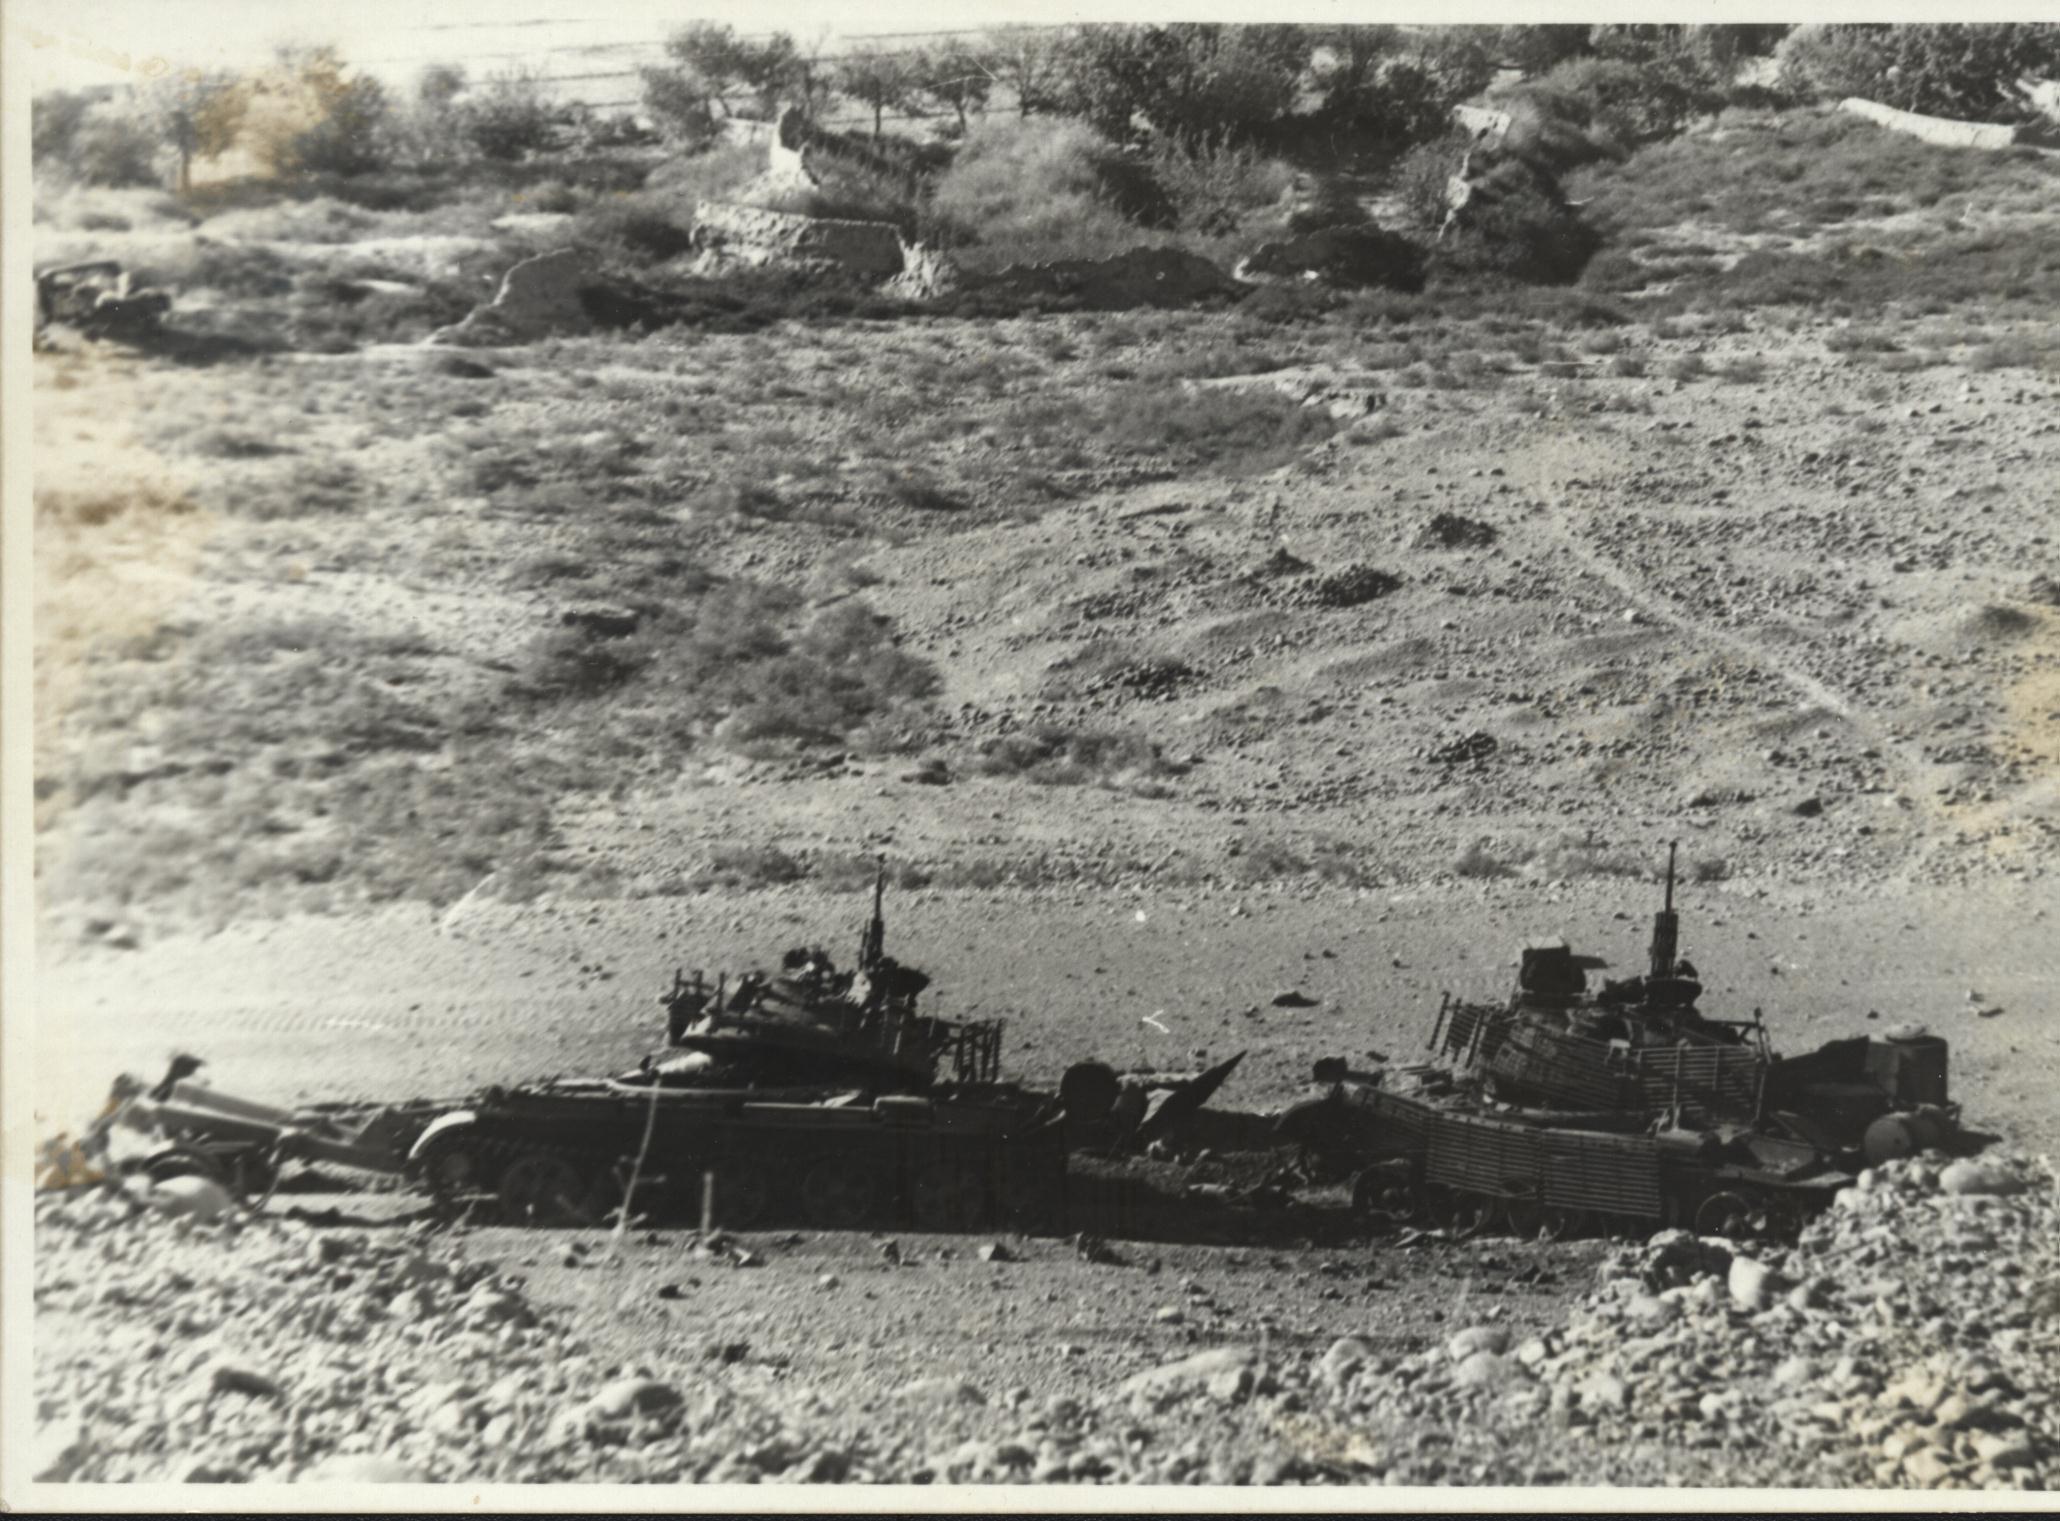 гильменд 1988 боевые действия